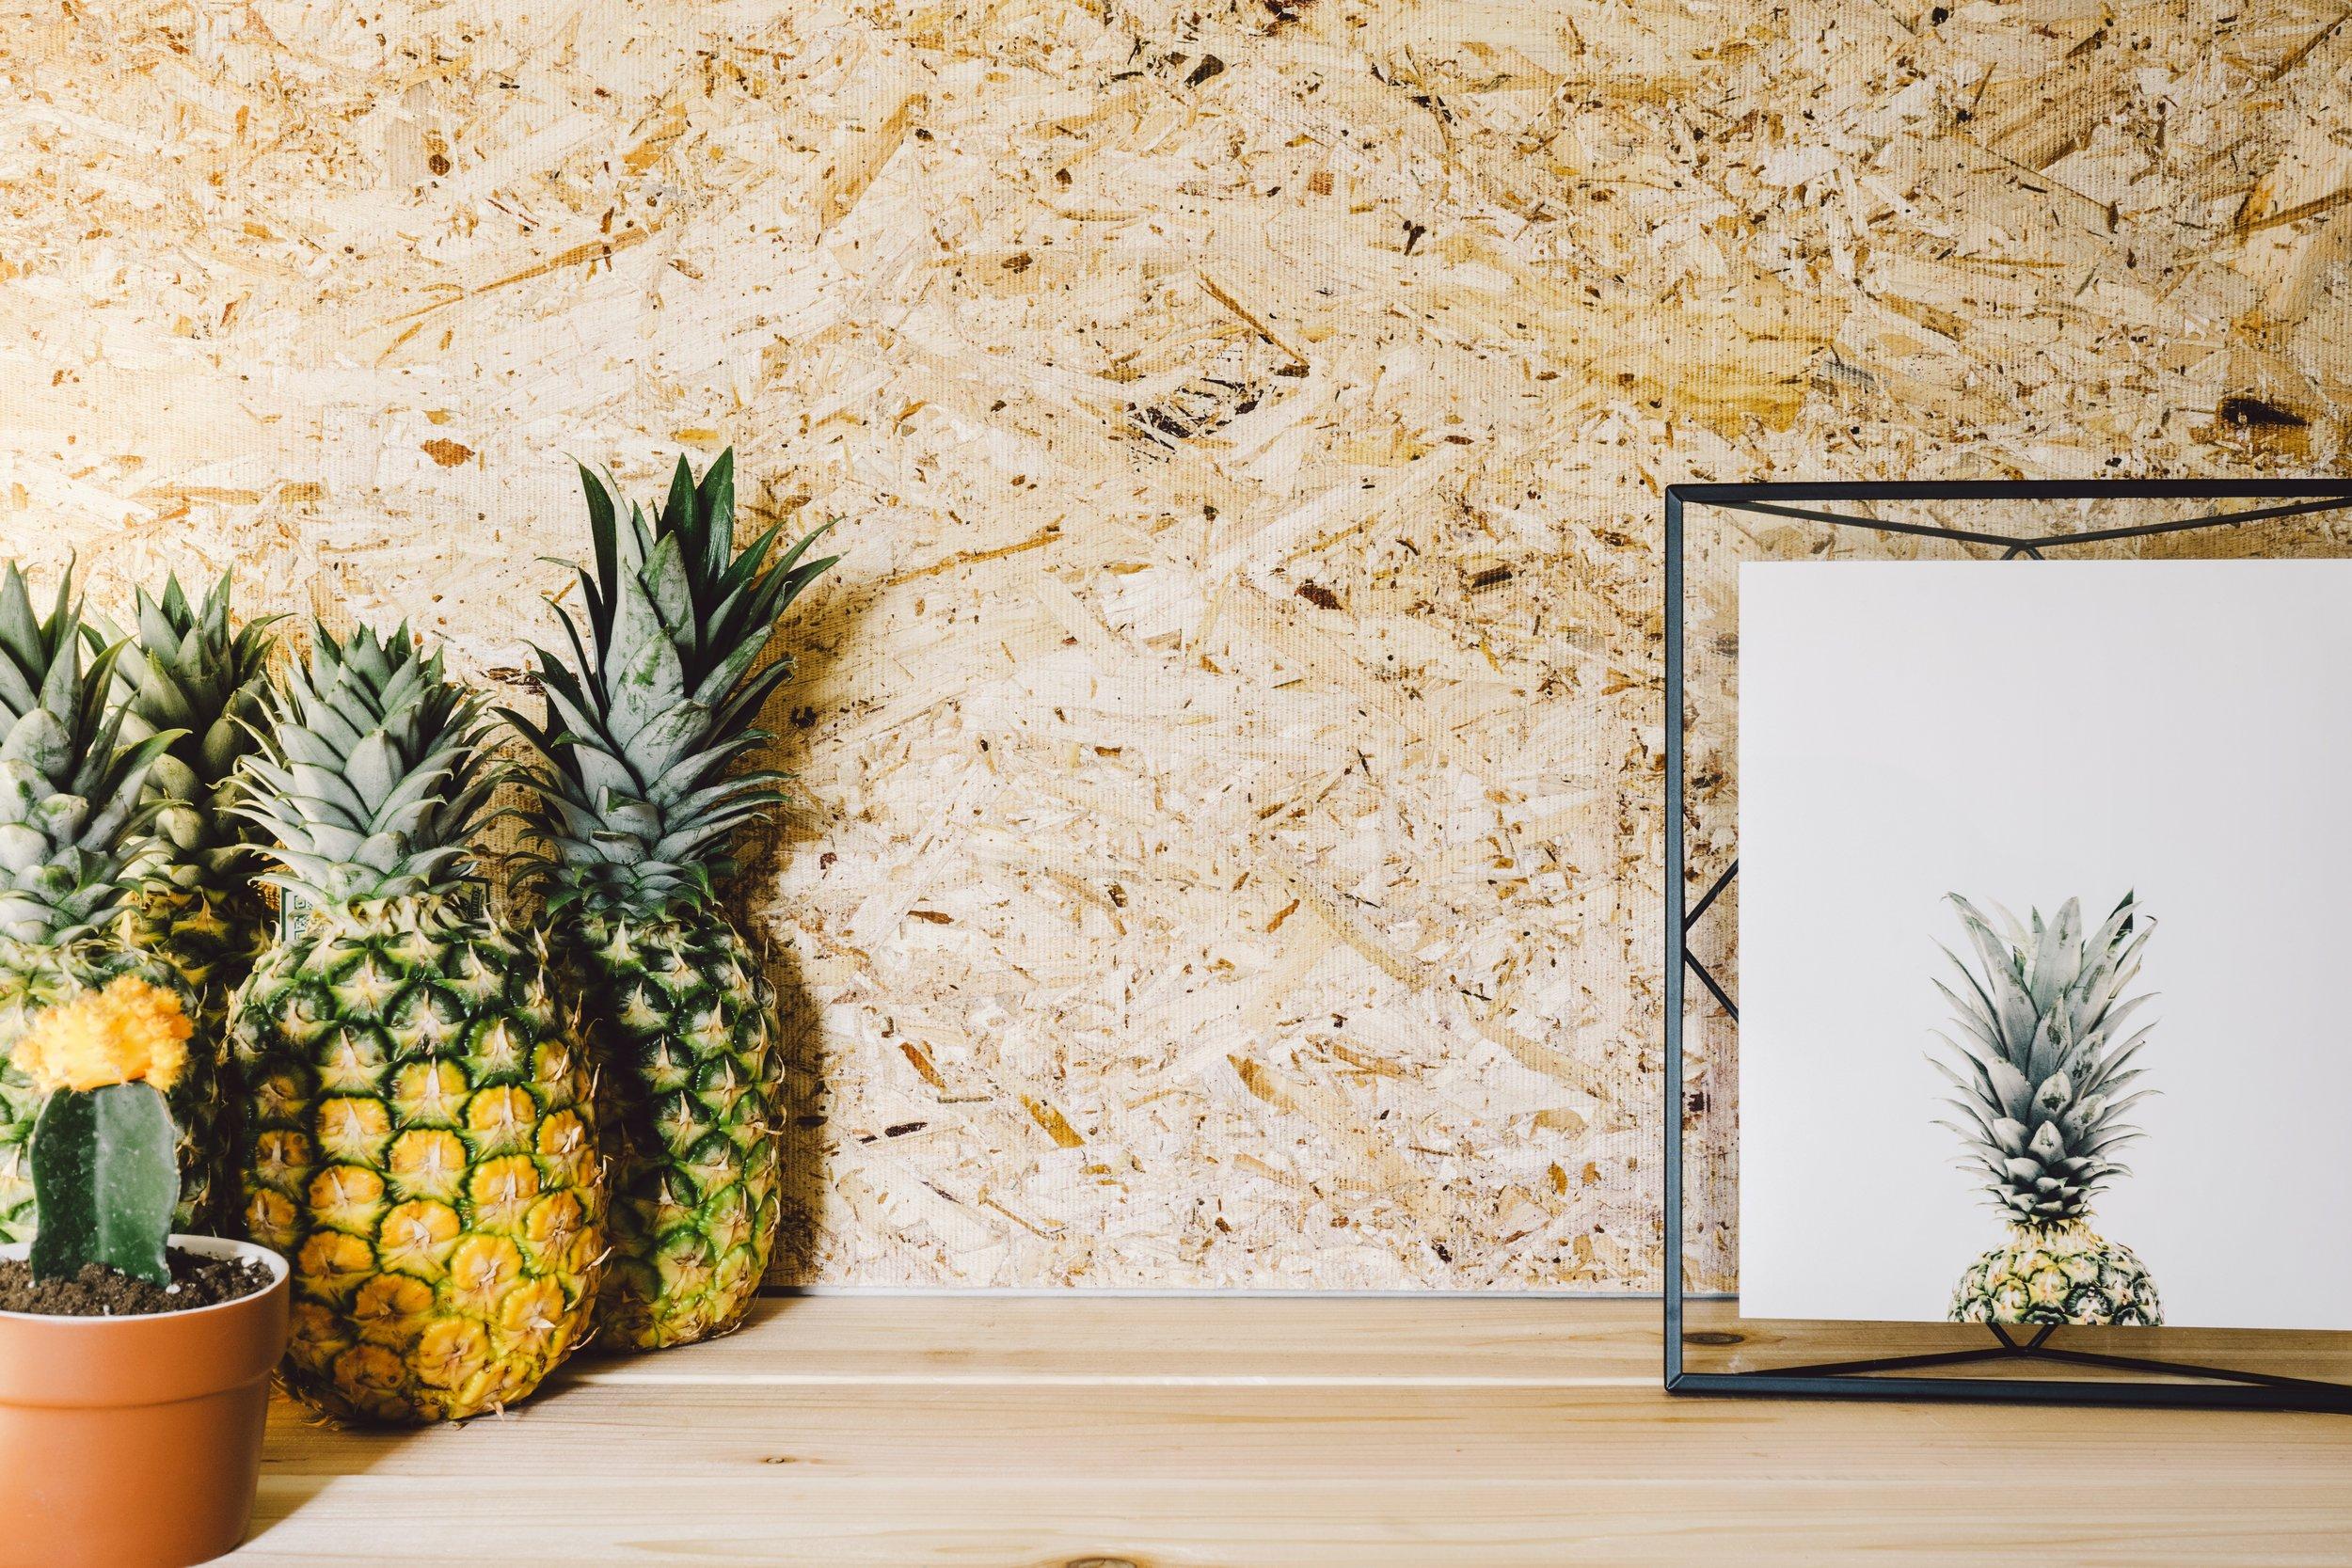 pineapple-supply-co-97627.jpg